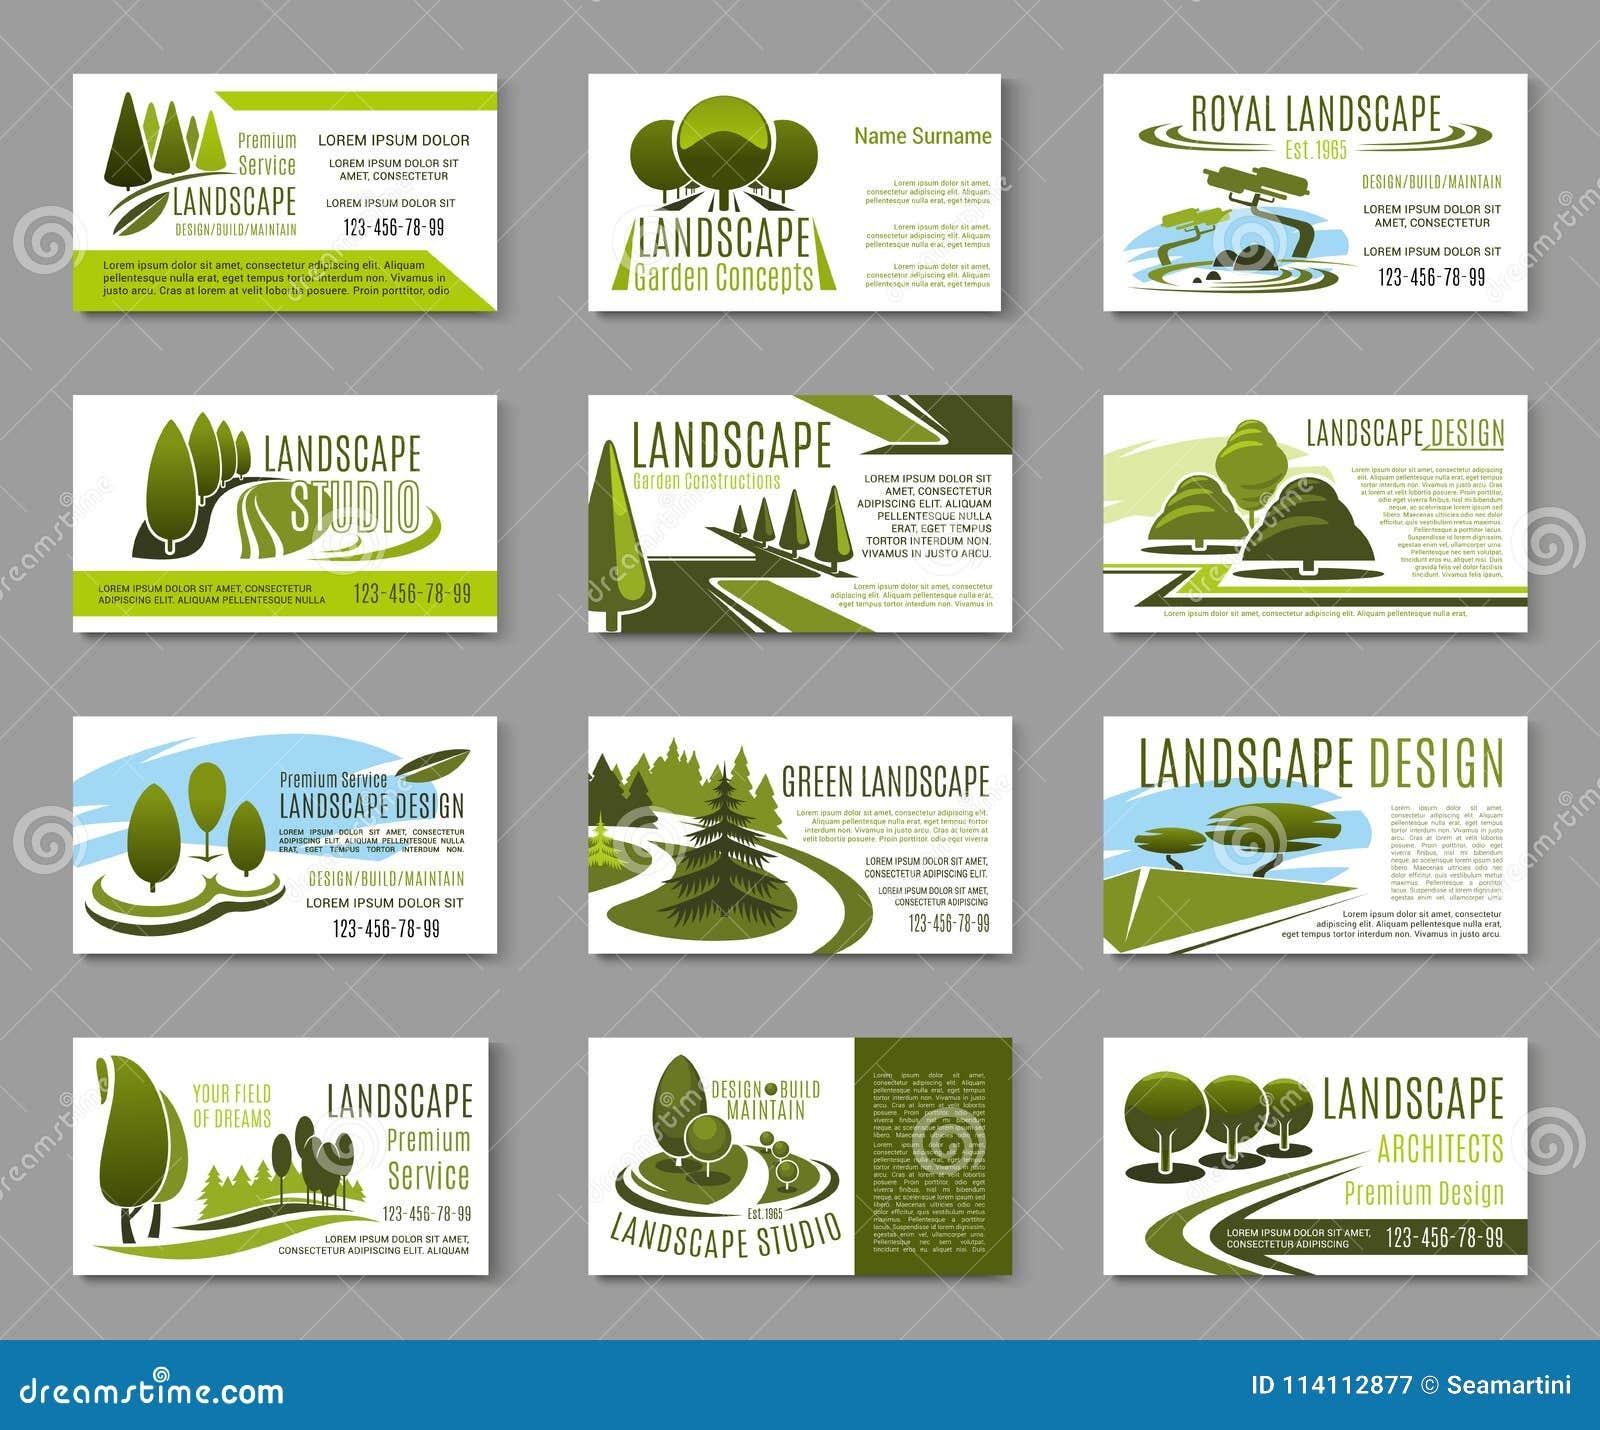 Landscape design studio business card template stock vector landscape design studio business card template accmission Images